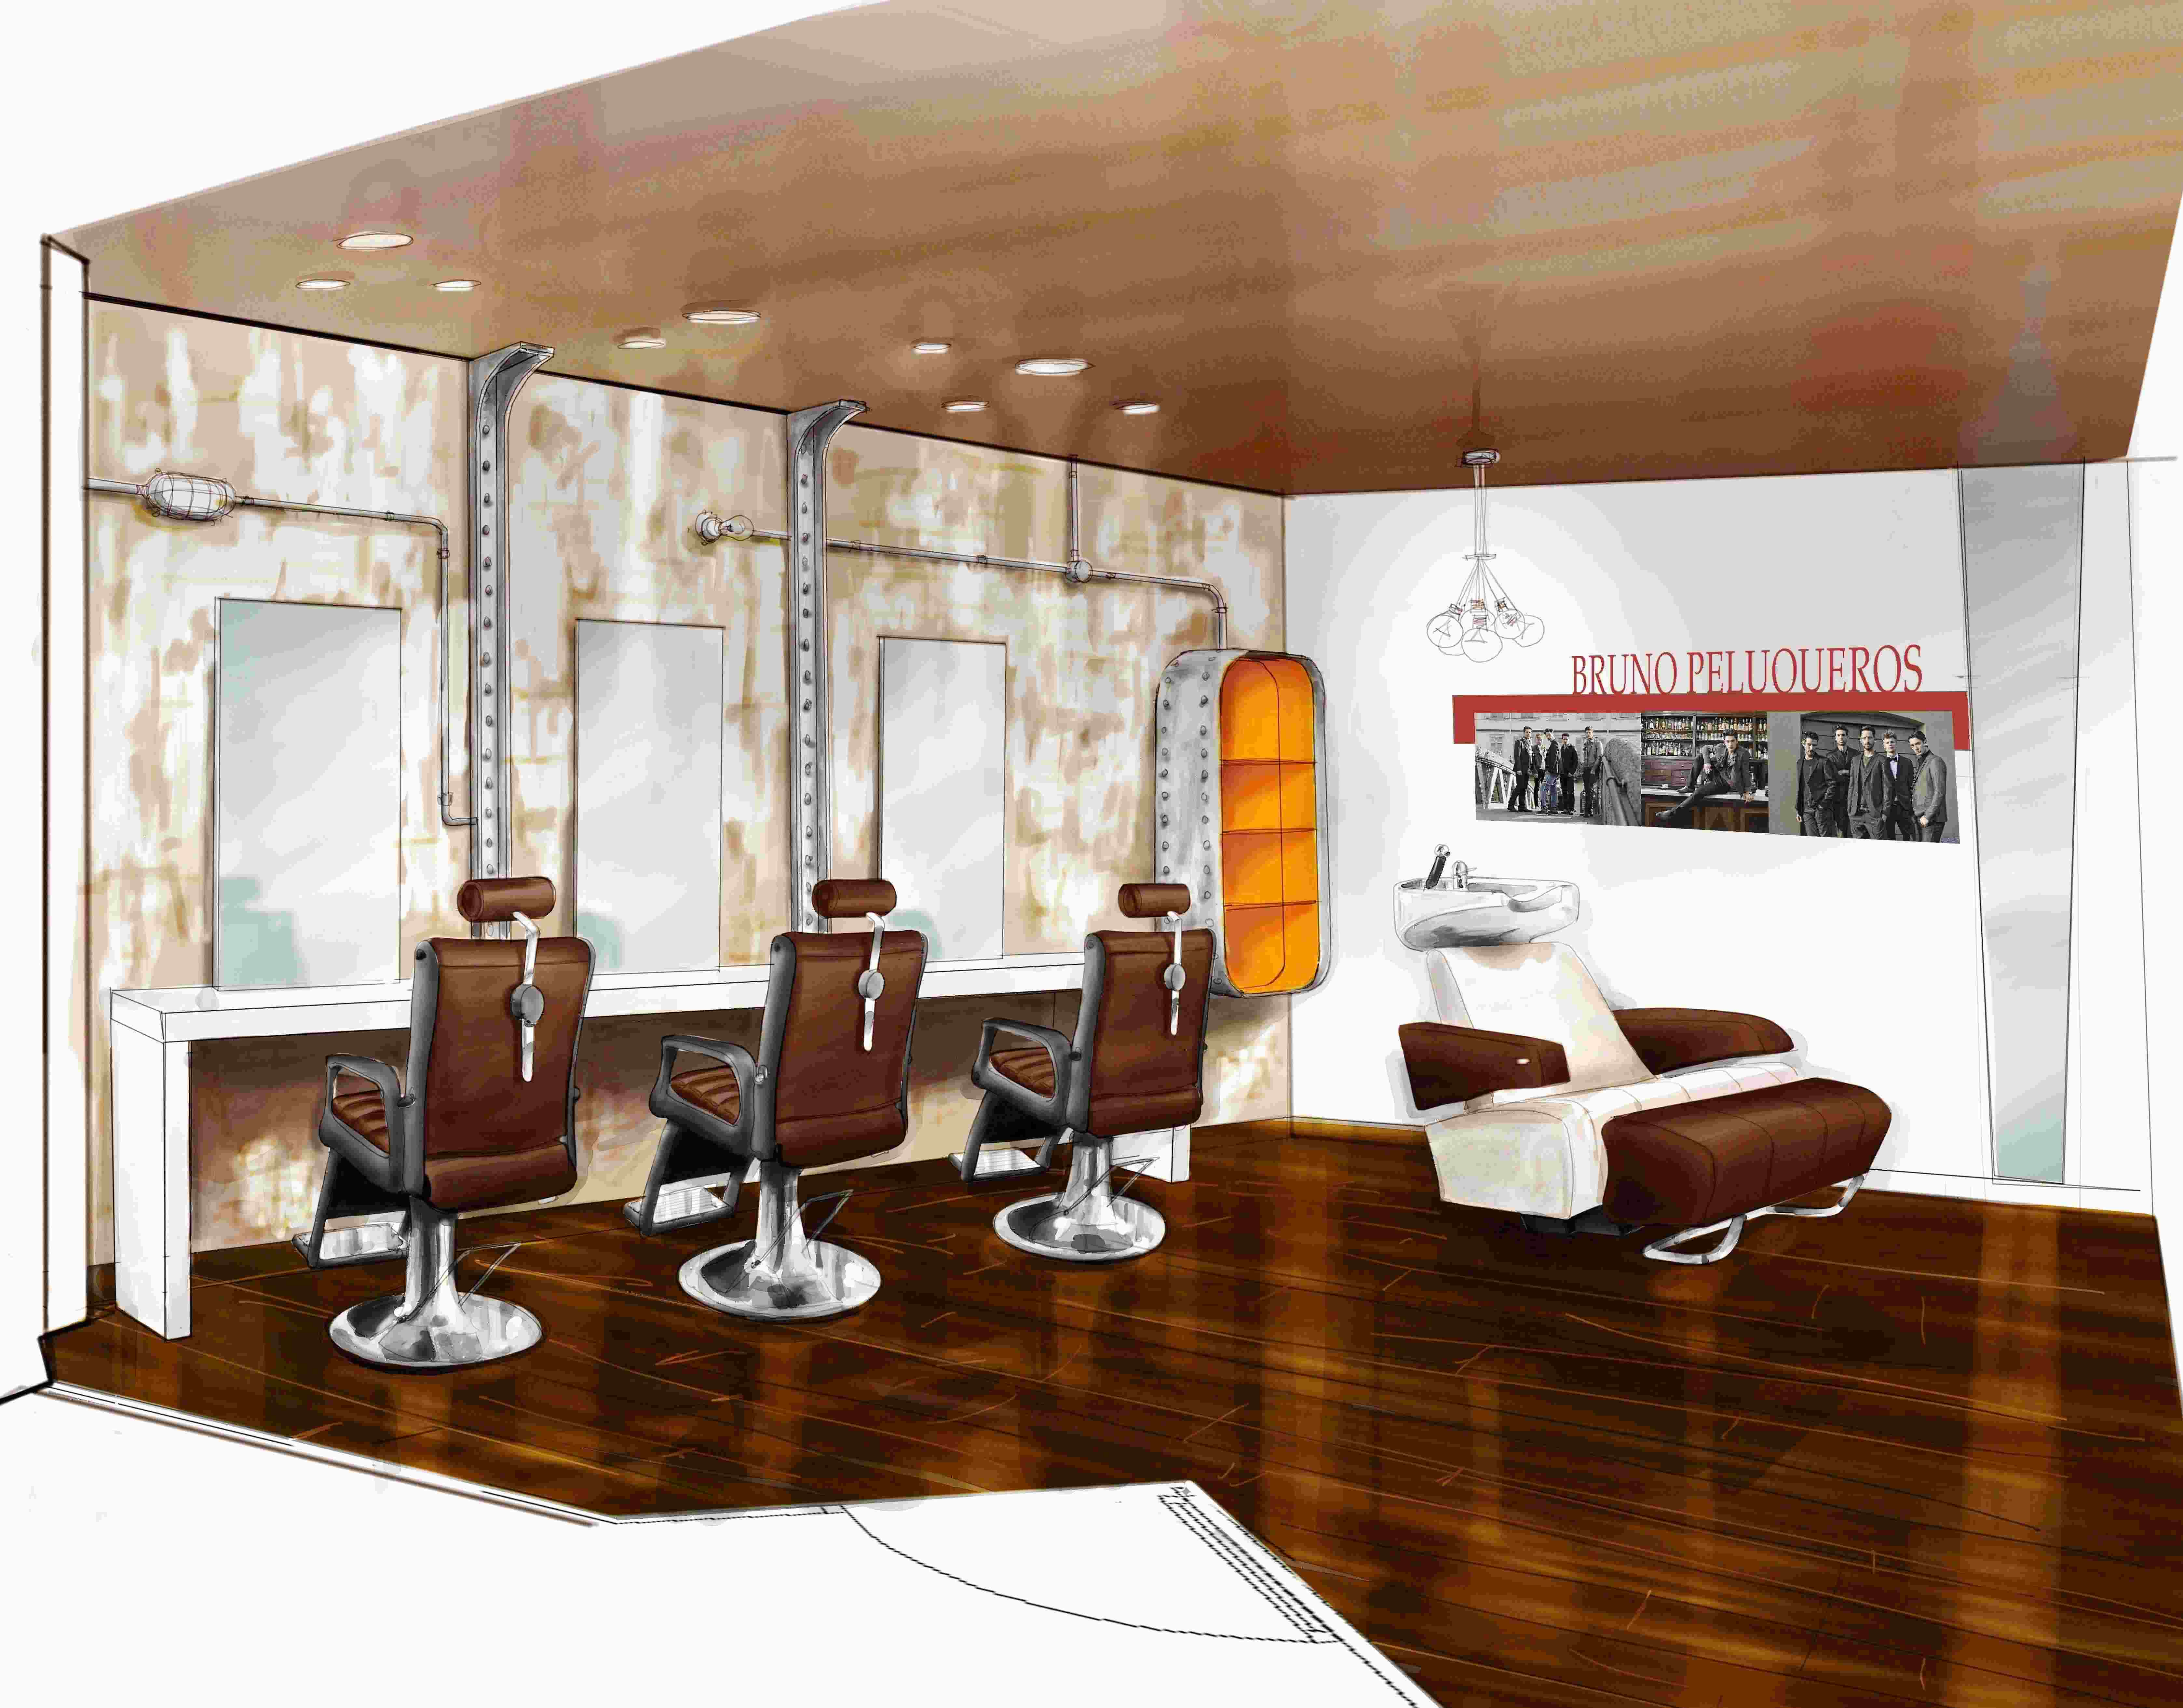 VISTA interior 1 PELIN MAS CLARA